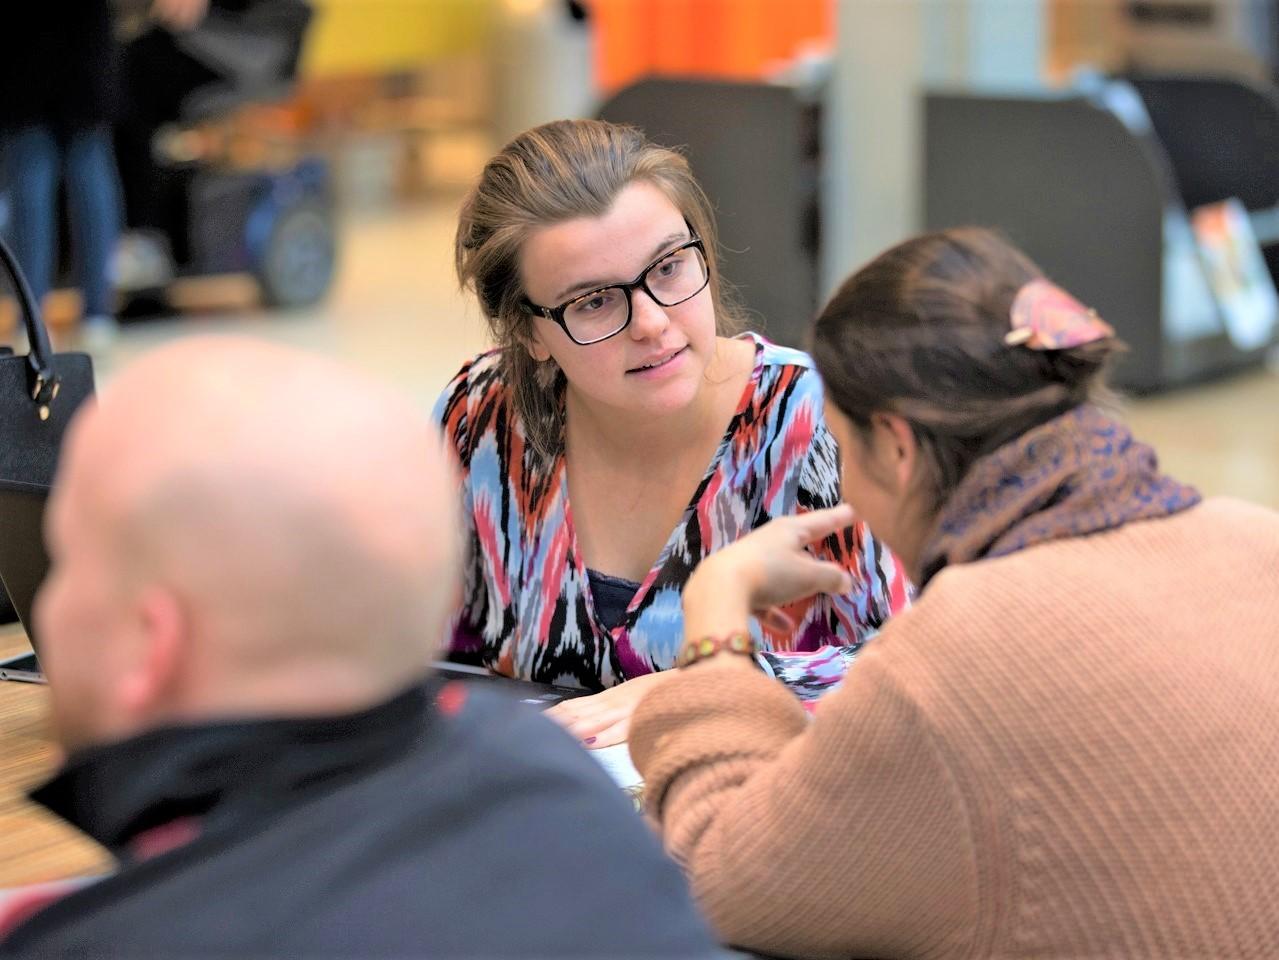 Vacature: Ondernemende people manager gezocht